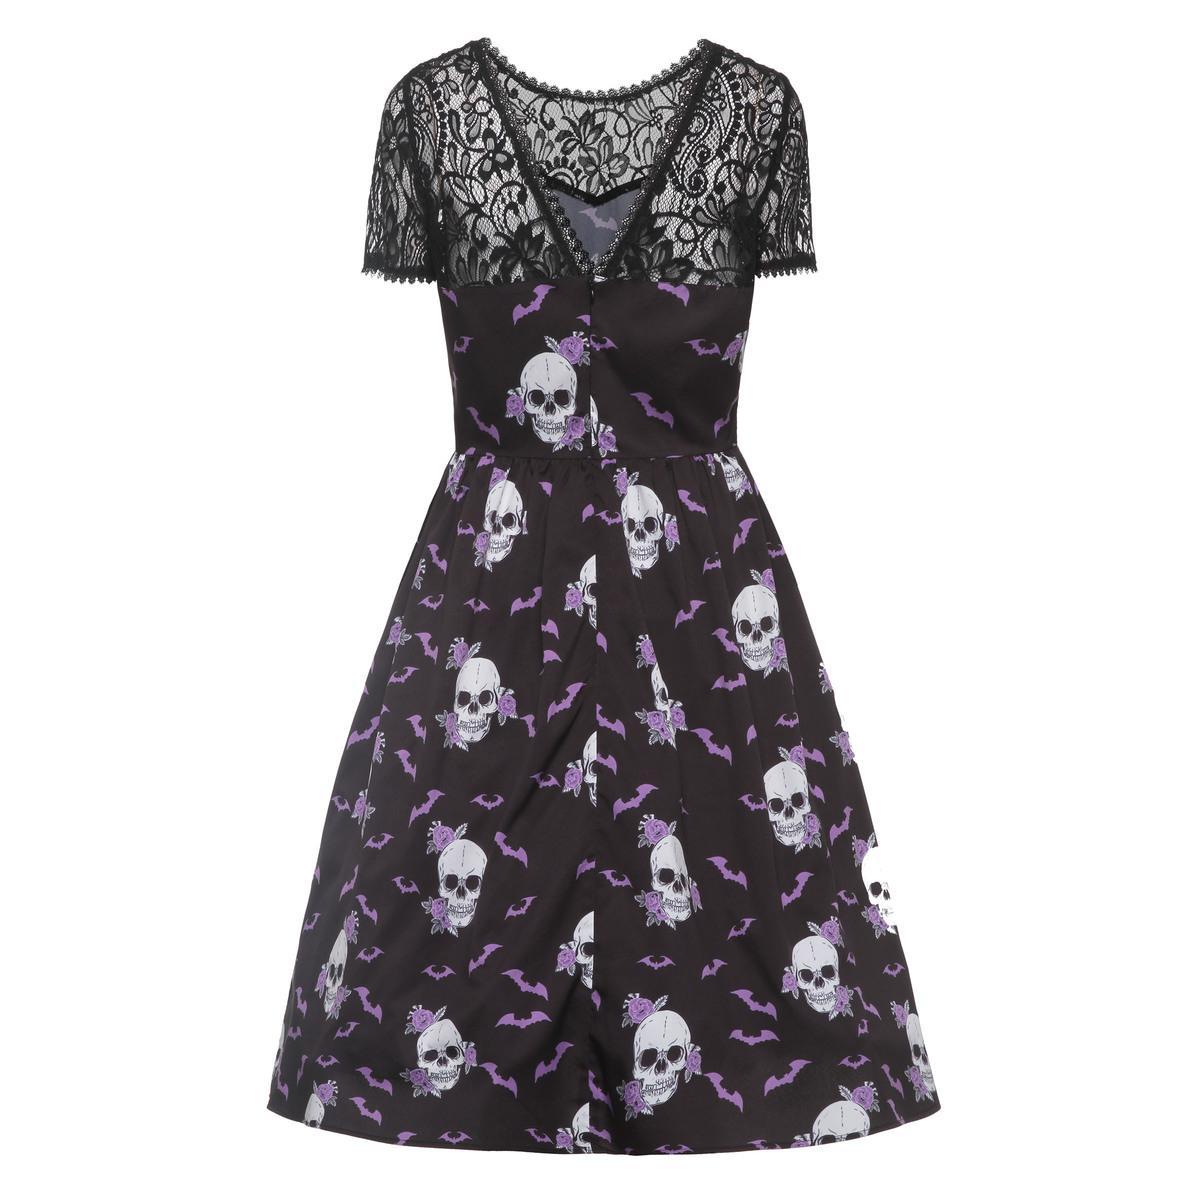 977b516f666 2019 Women Skull Dress Summer Black See Through Dress Gothic Dress Female  Backless Lace Dresses Evening Dress Sweater Dress From Bibei10